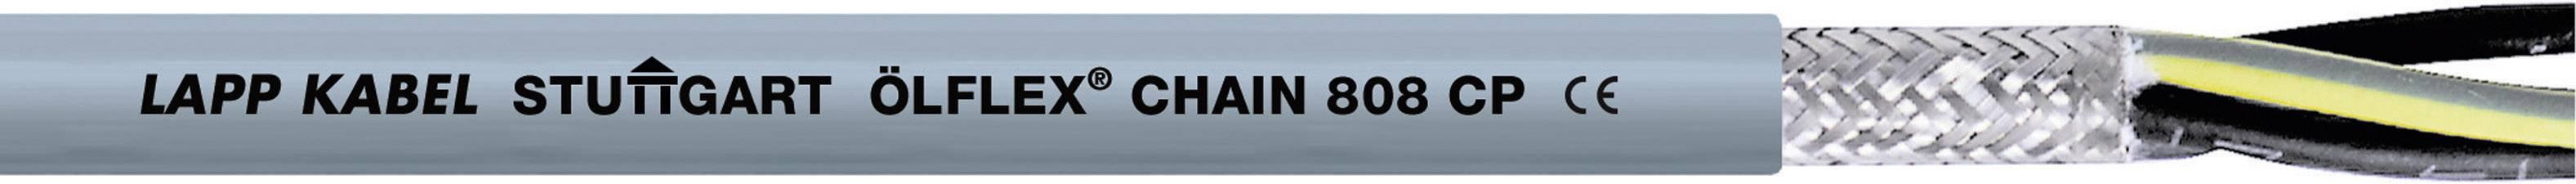 Žíla kabelu LappKabel ÖLFLEX CHAIN 808 CP 18G0,5 (1027757), 18x 0,5 mm², polyurethan, Ø 11,8 mm, stíněný, 50 m